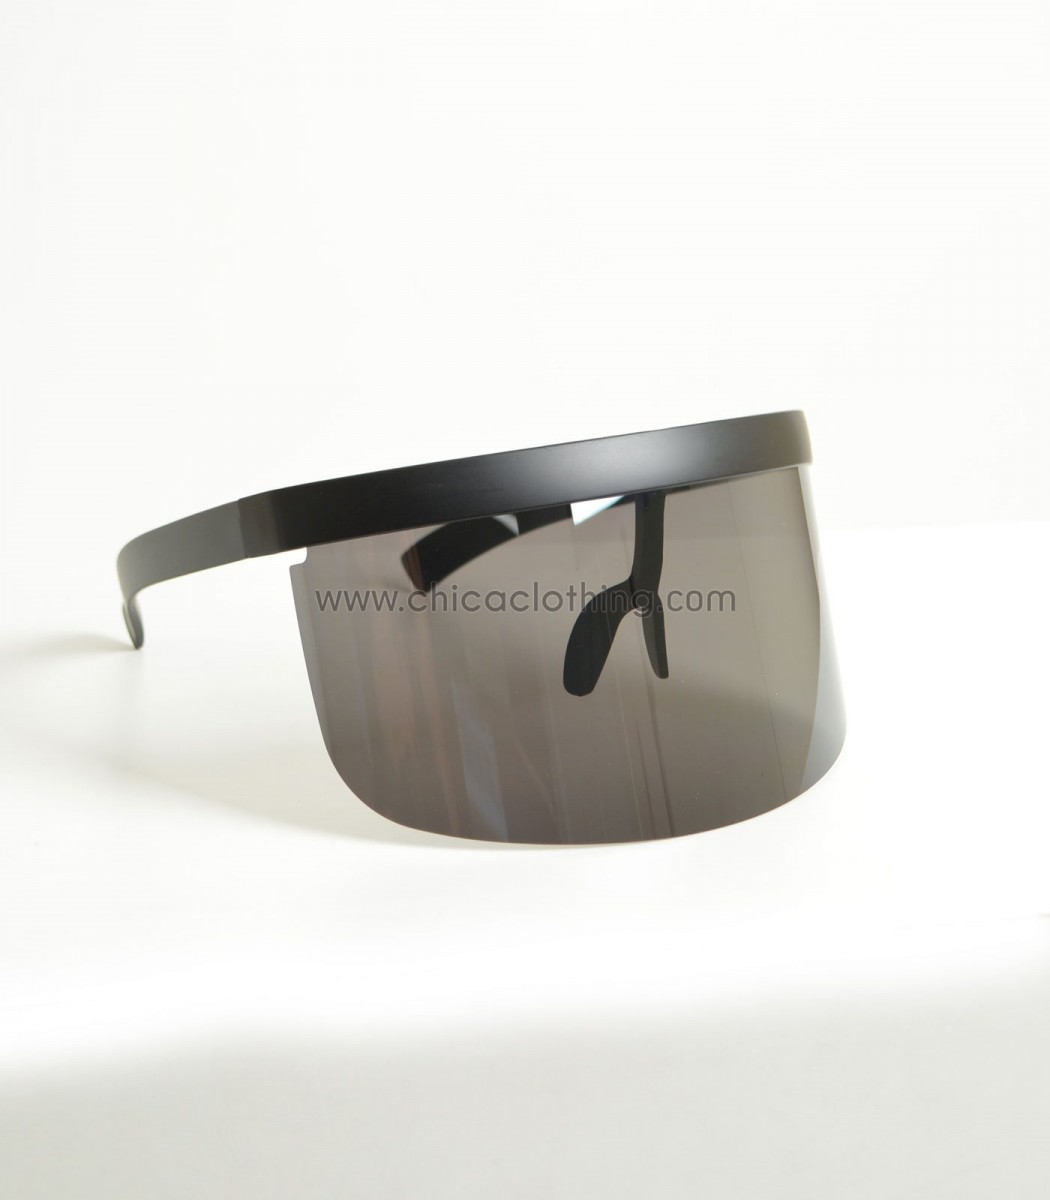 7357f80cf9 Γυαλιά ηλίου μάσκα με μαύρο φακό